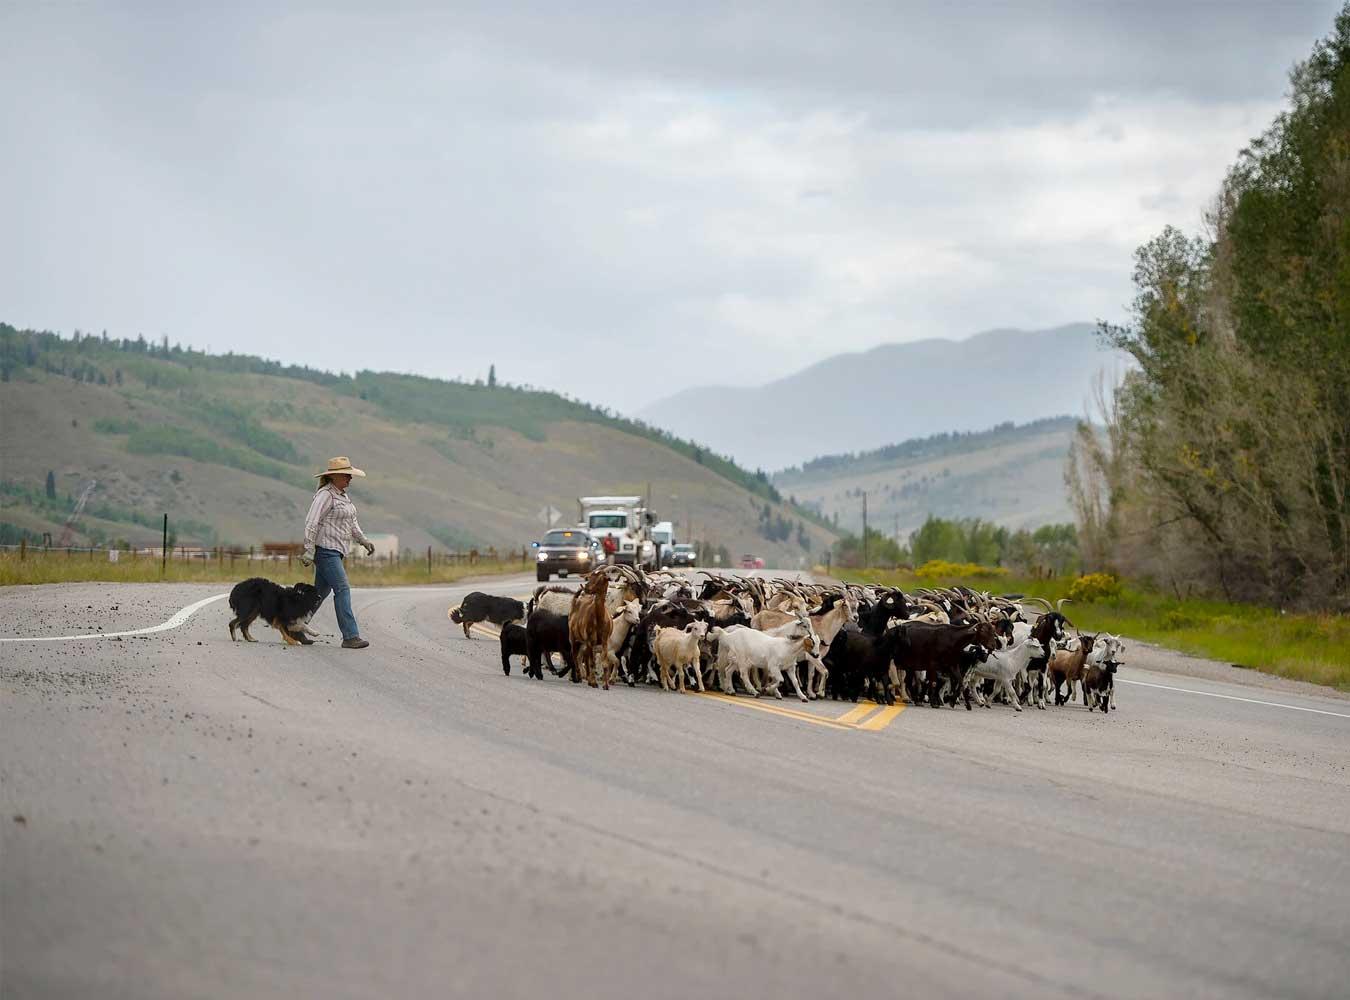 press new york times wildfire goats prevention goatapelli lani malmerg